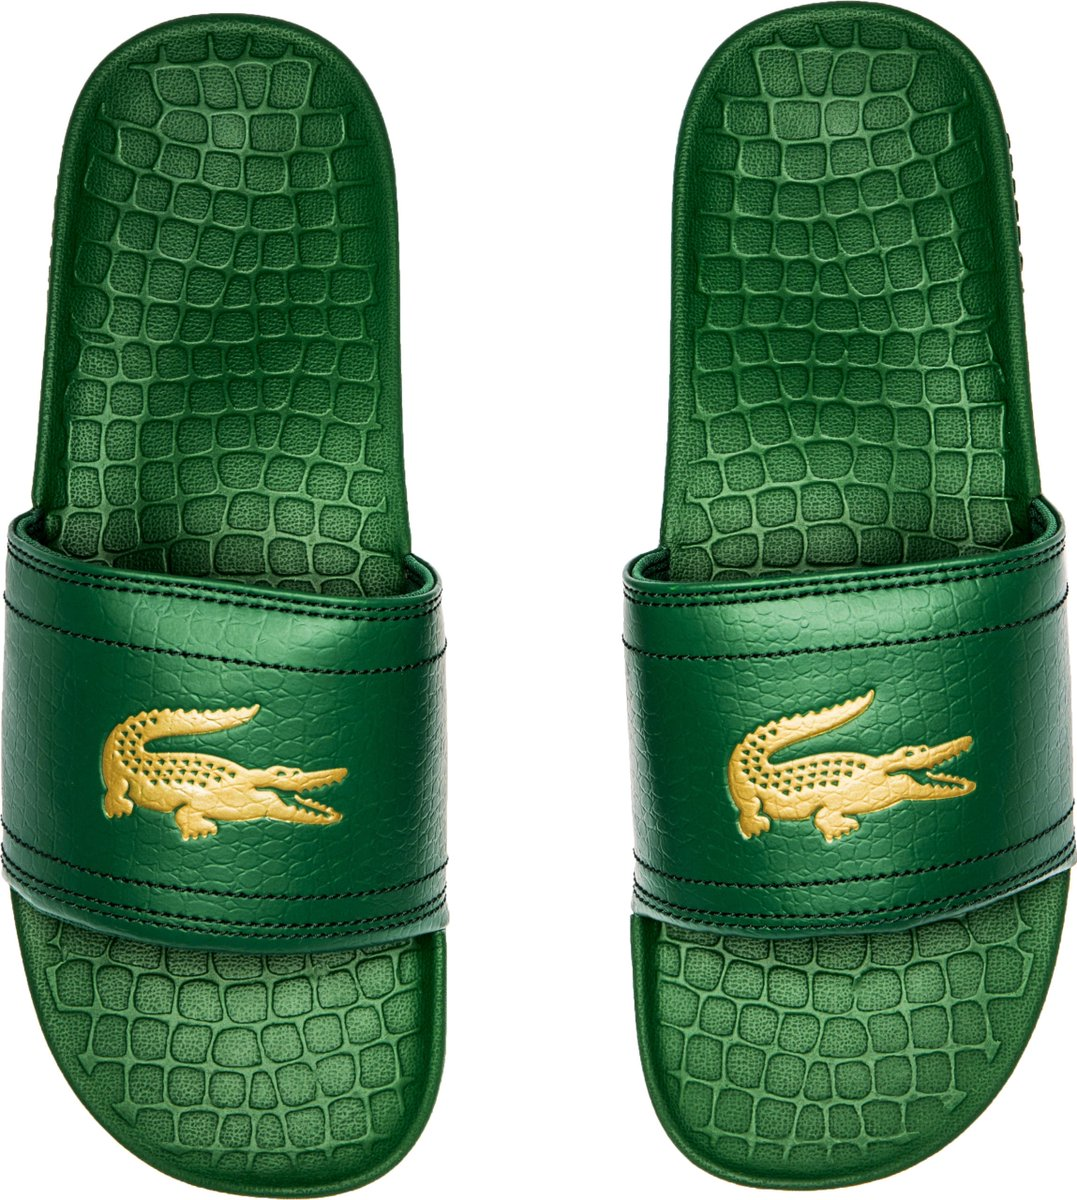 5229c08e84ae Lacoste fraisier croc mens slide on sandals (black gold) - scoopnest.com